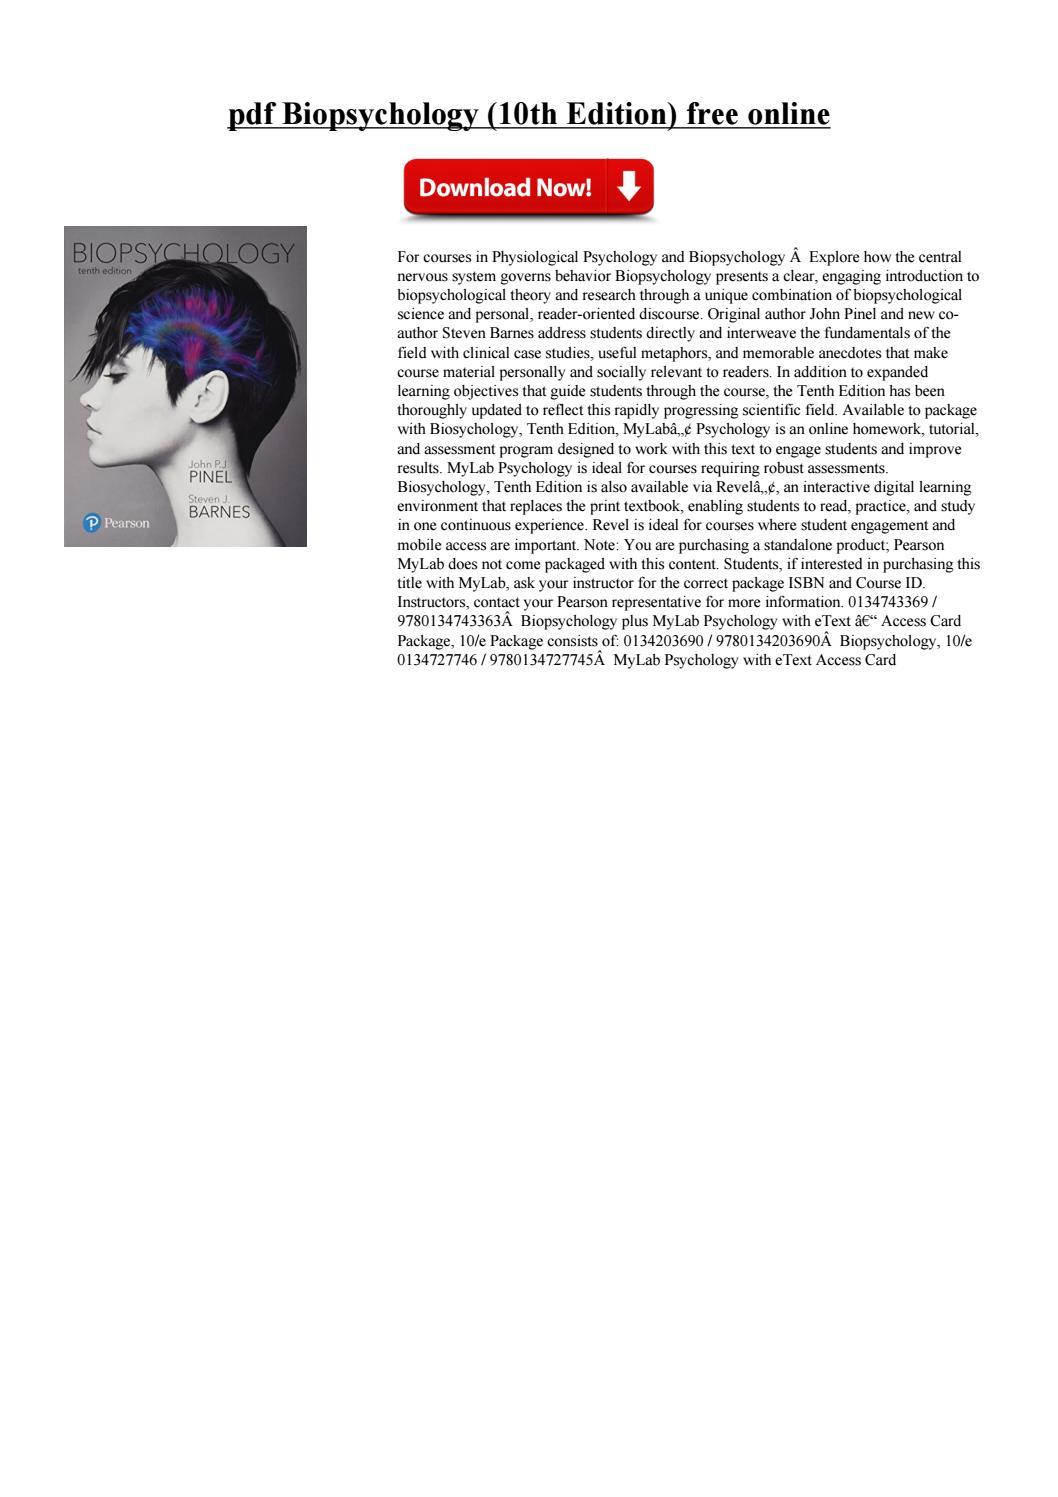 Biopsychology 10th Edition Pdf Free